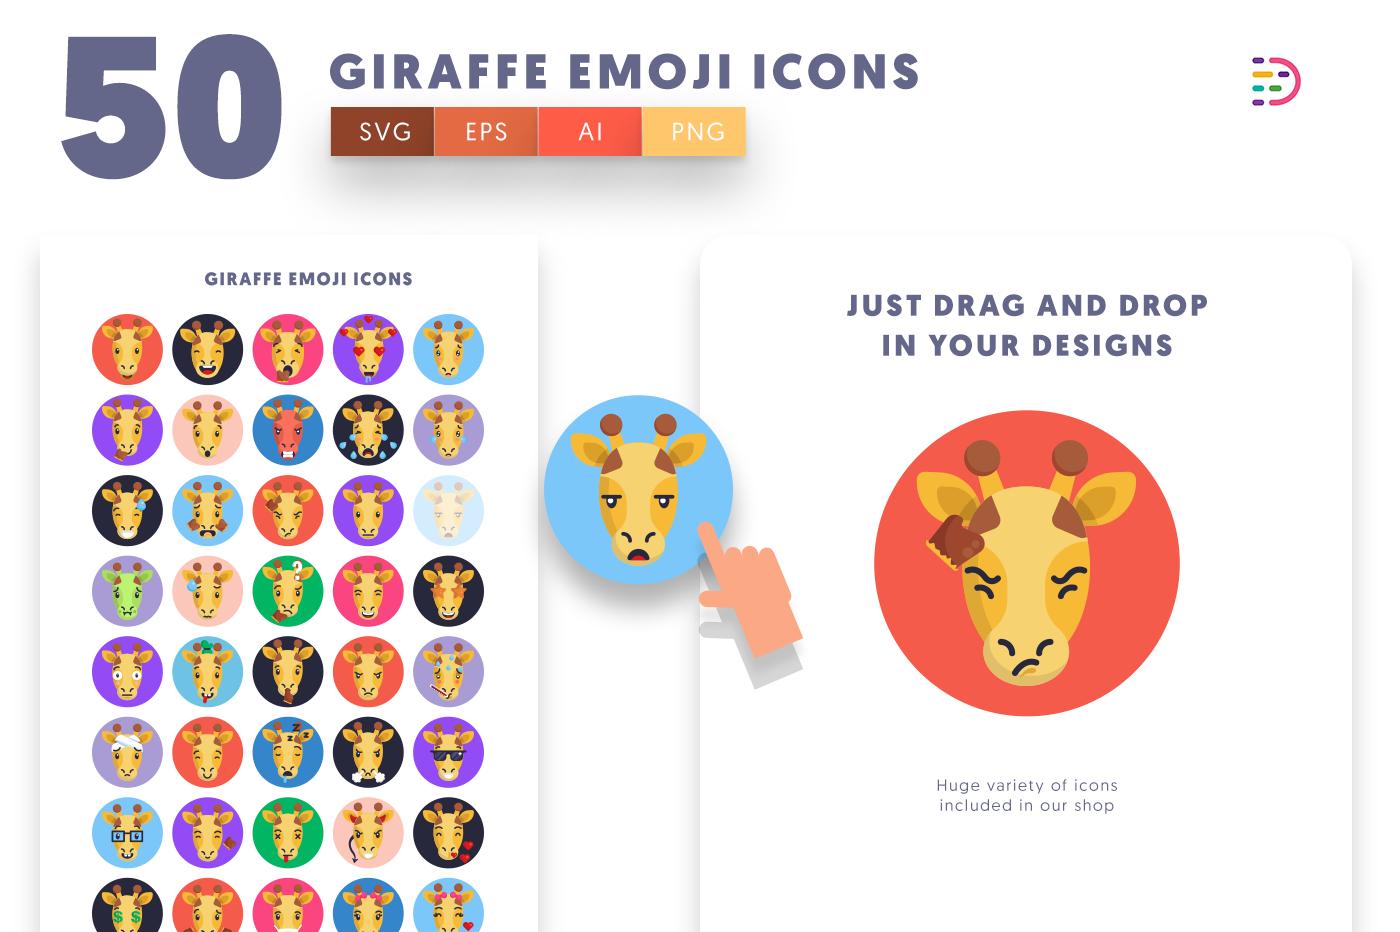 Drag and drop vector 50 Giraffe Emoji Icons